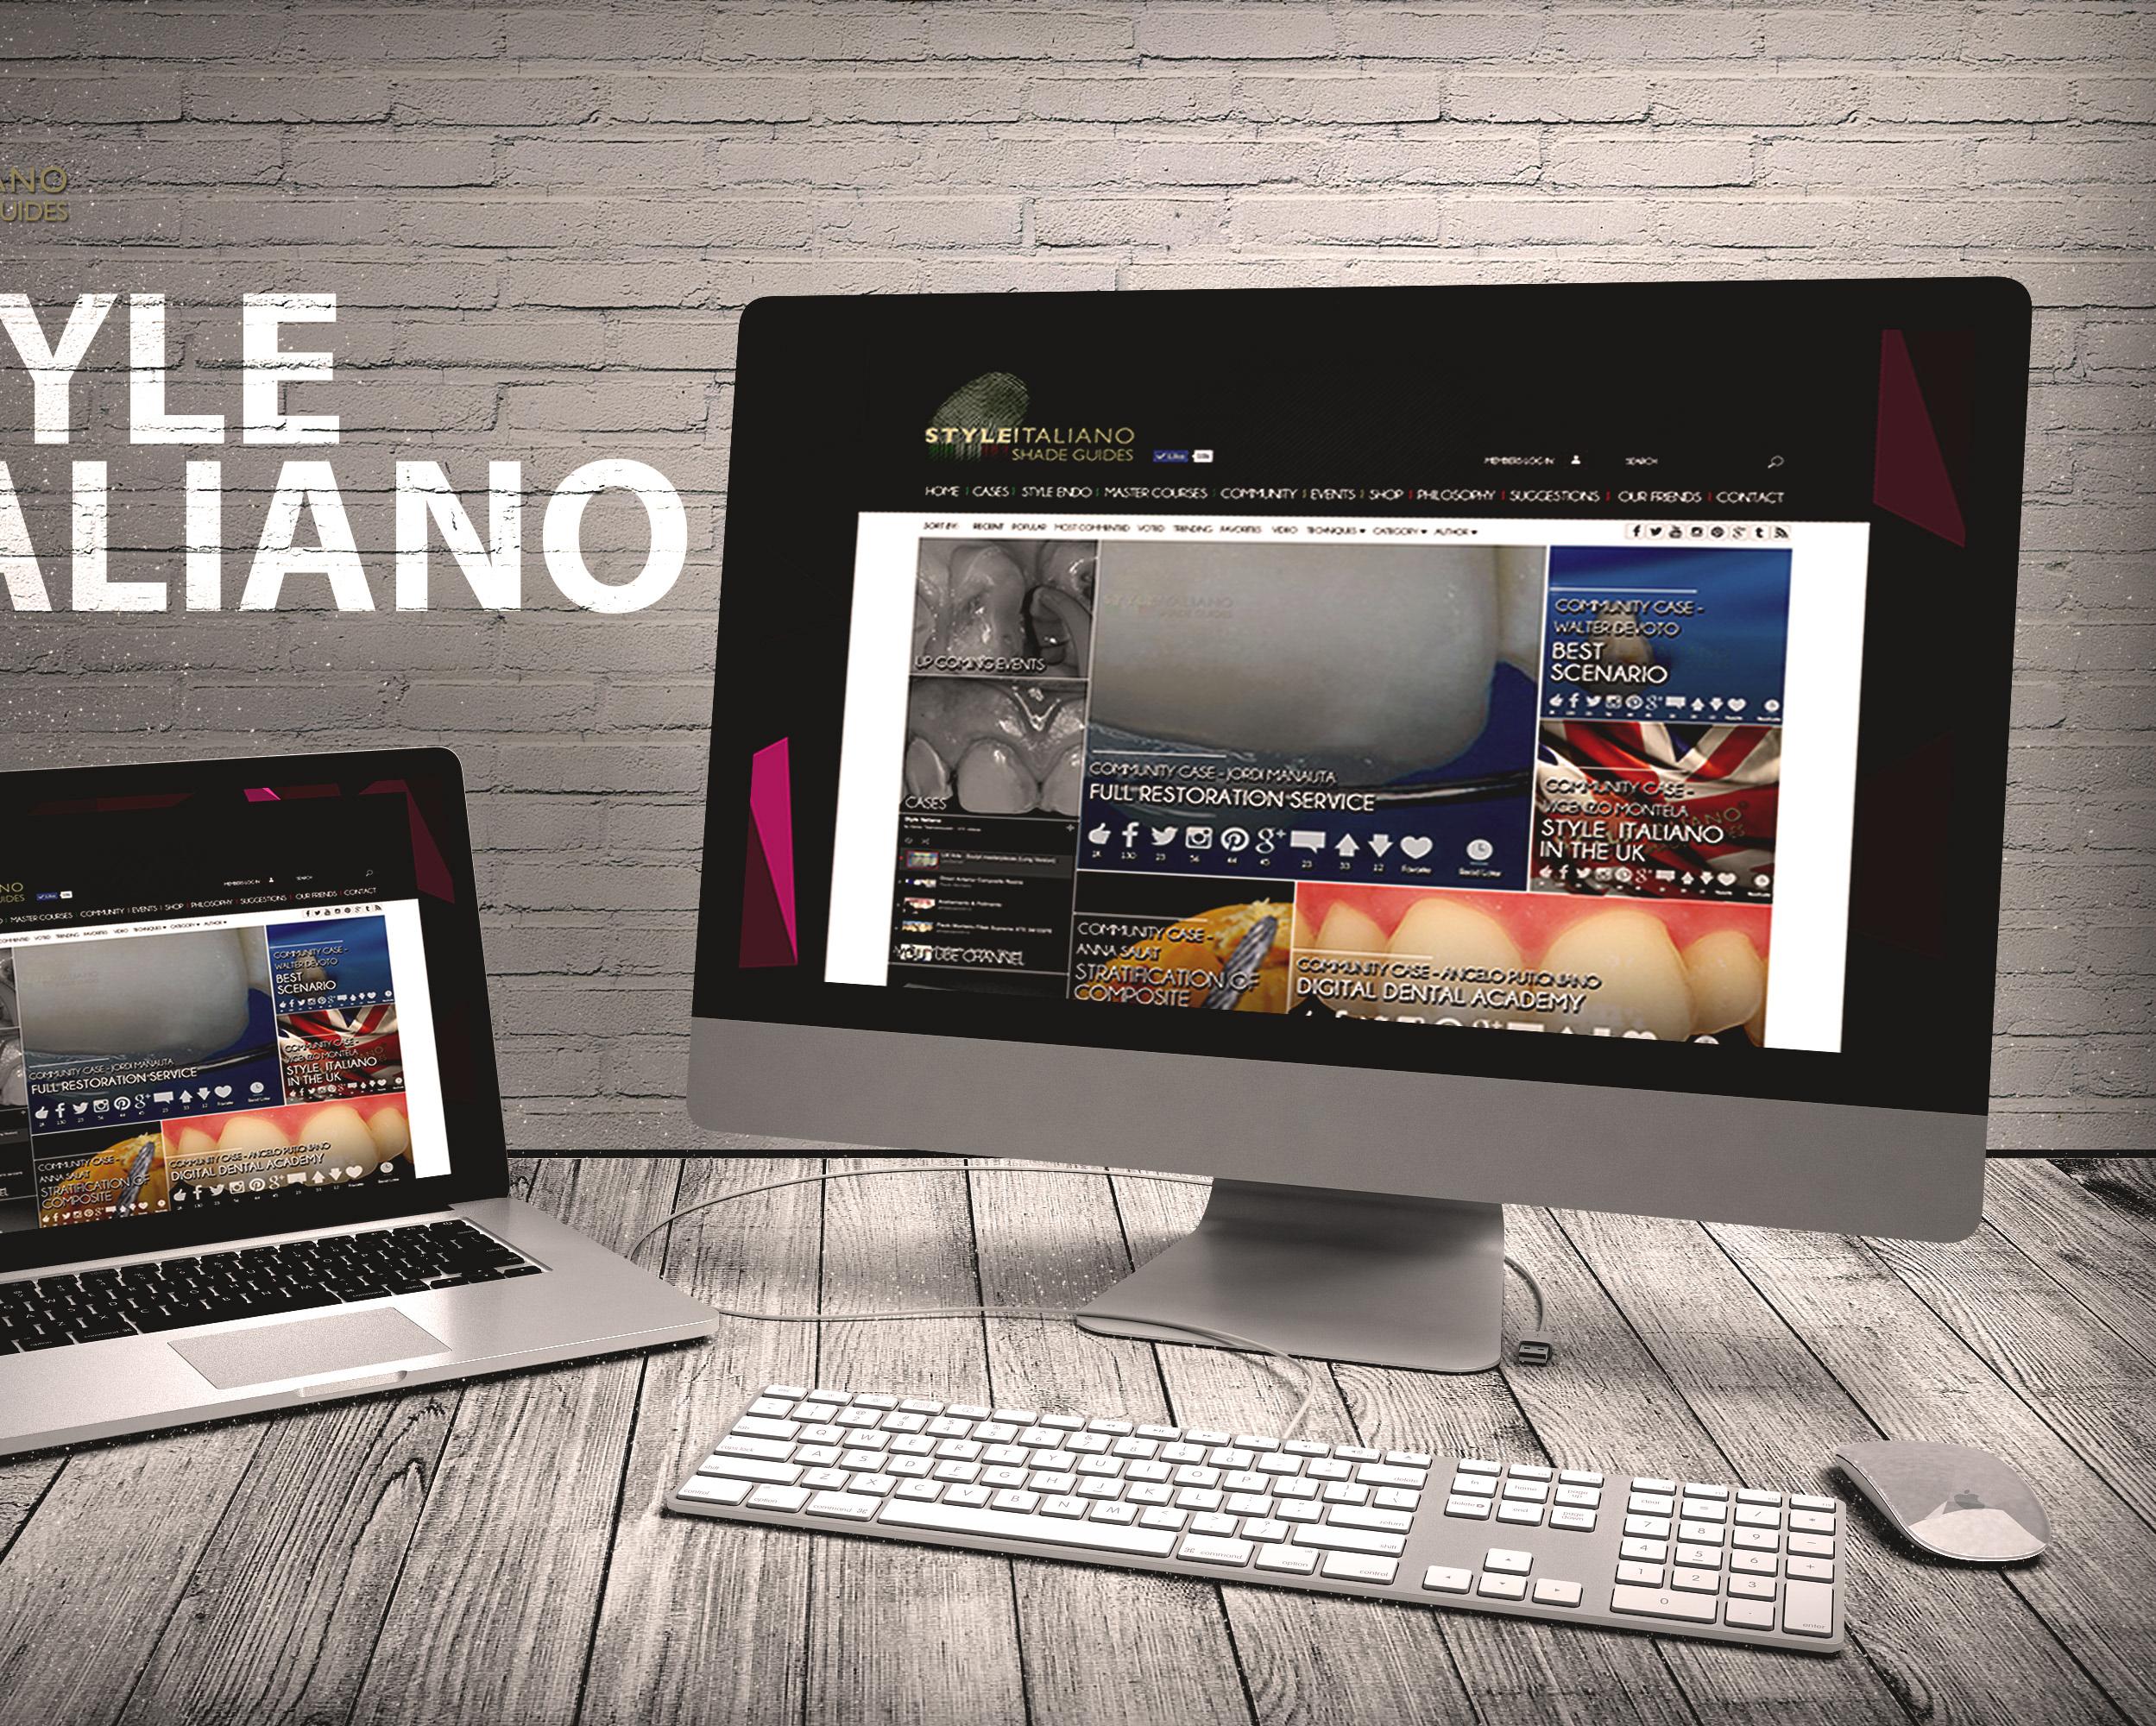 Asterizco publicidad for Professional home design 7 0